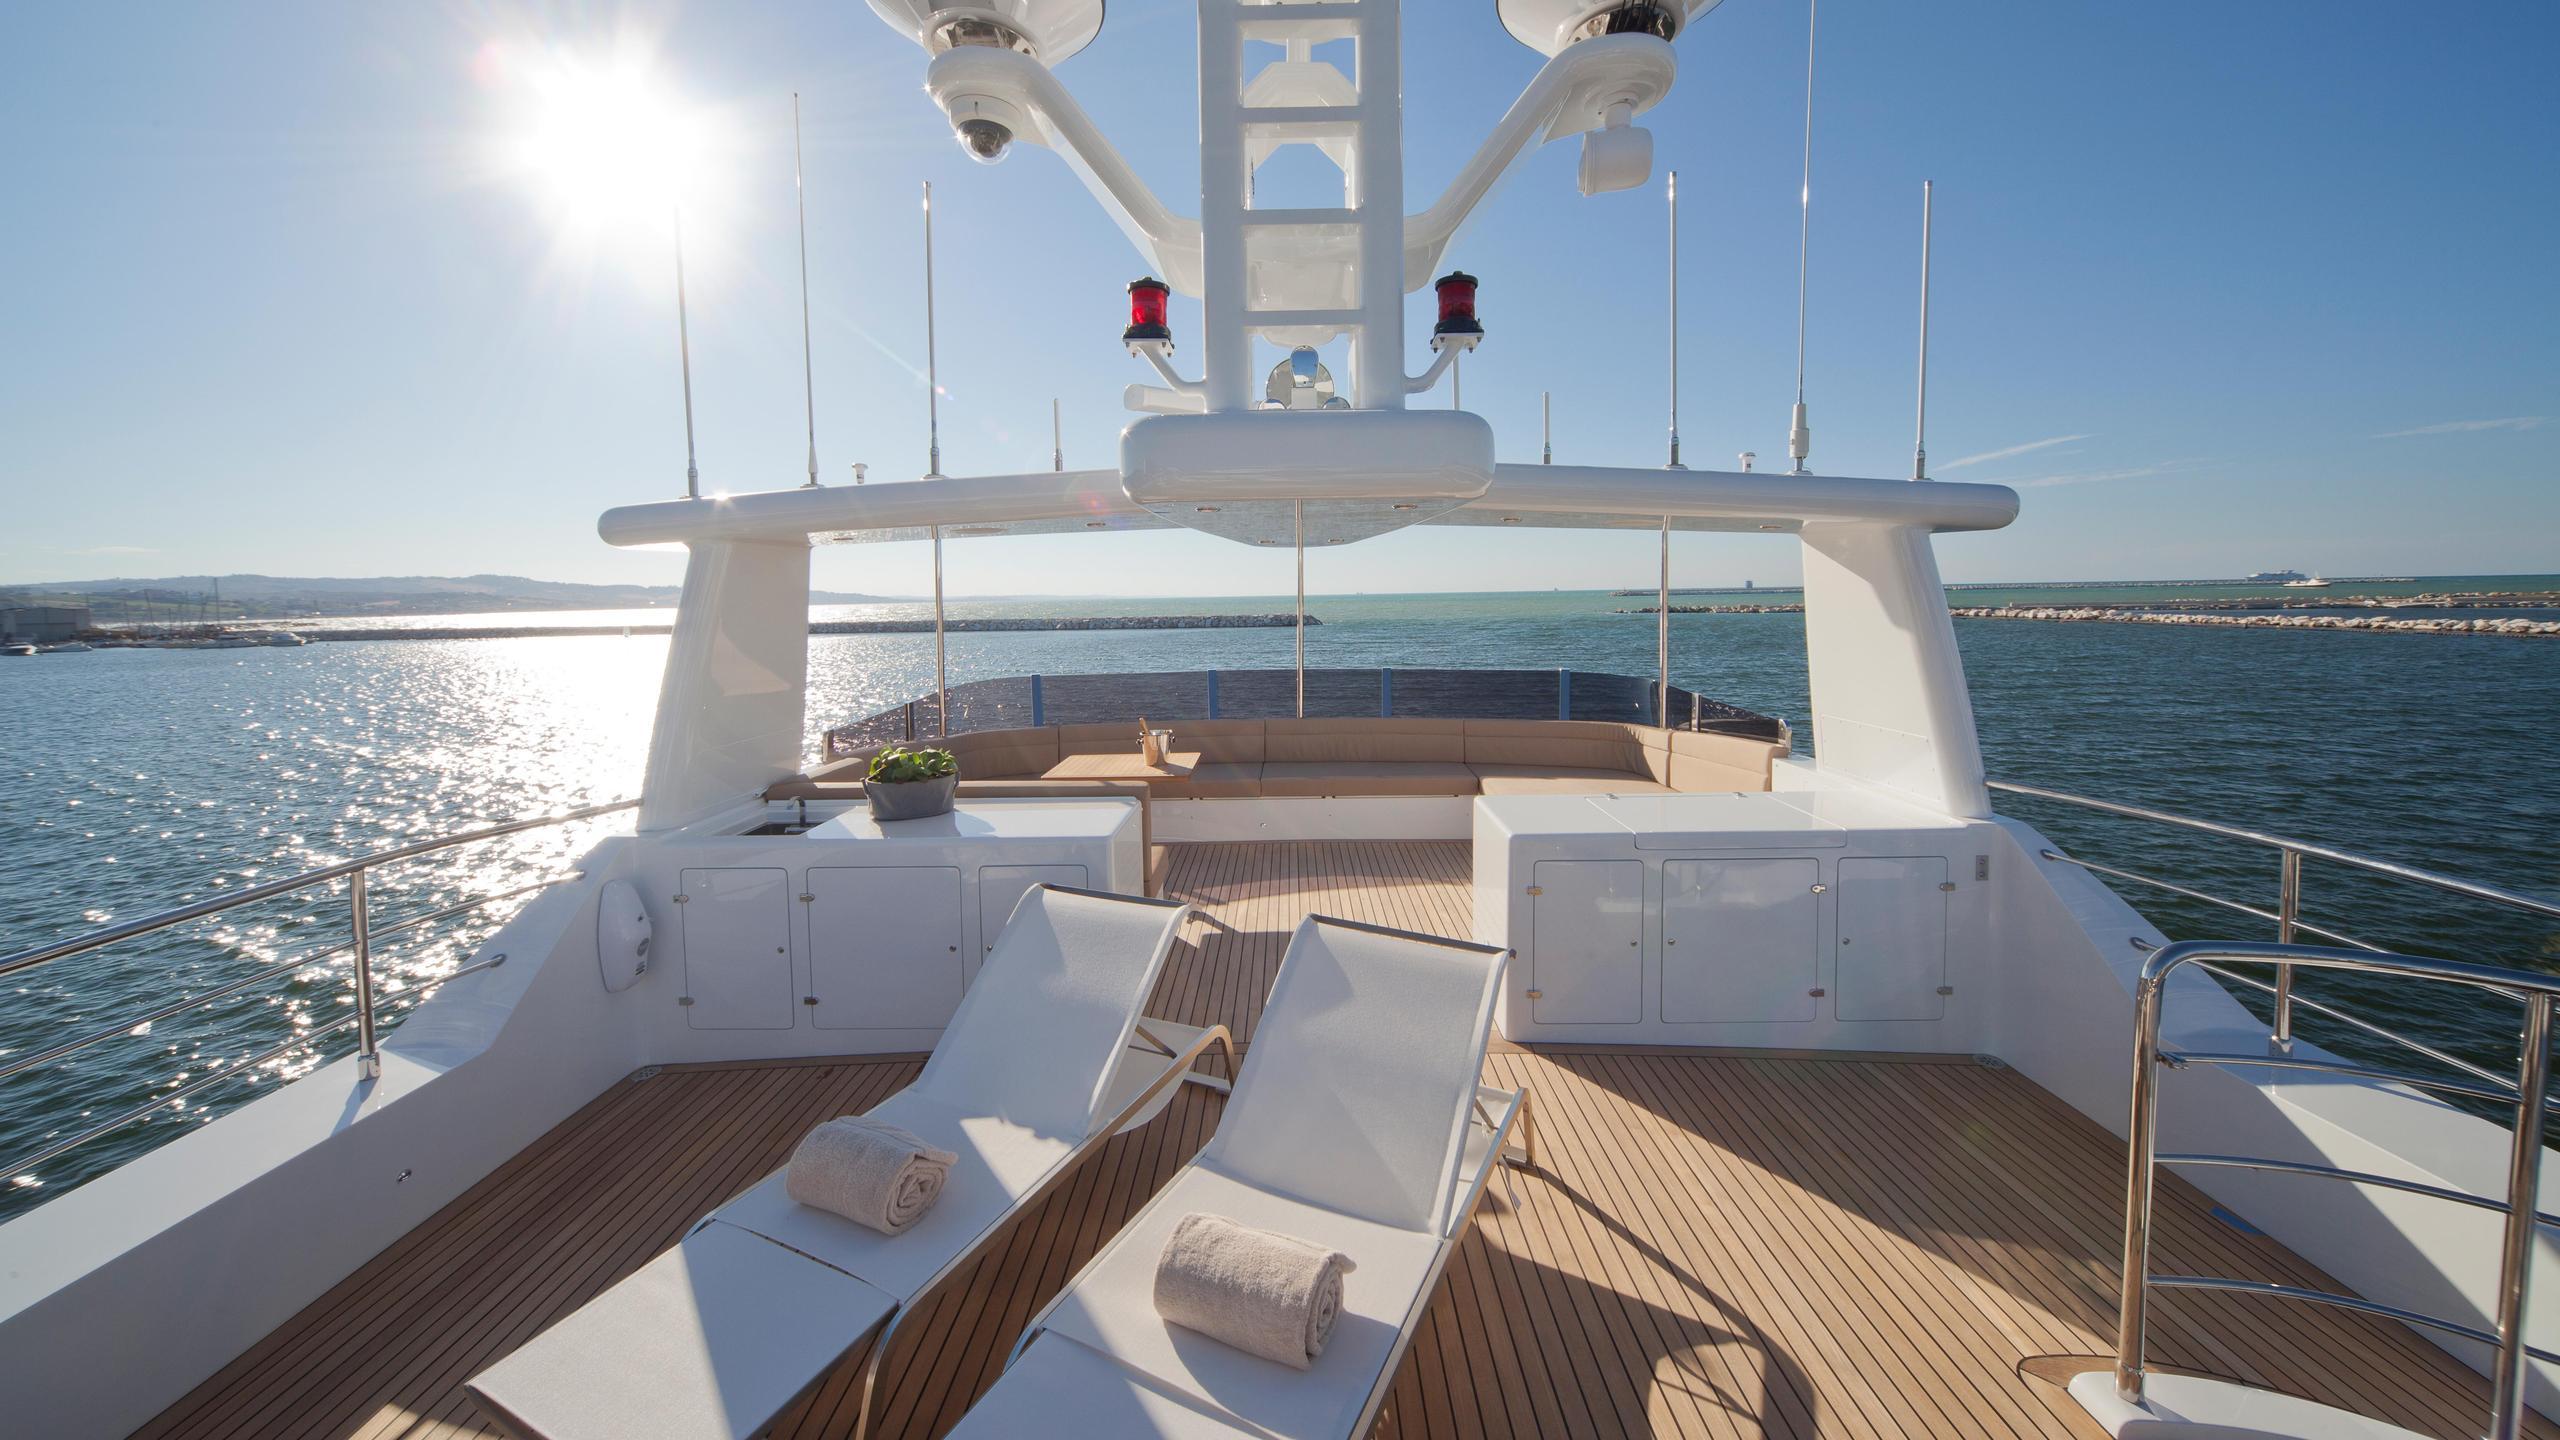 percheron-motor-yacht-cantiere-delle-marche-darwin-86-2012-26m-sundeck